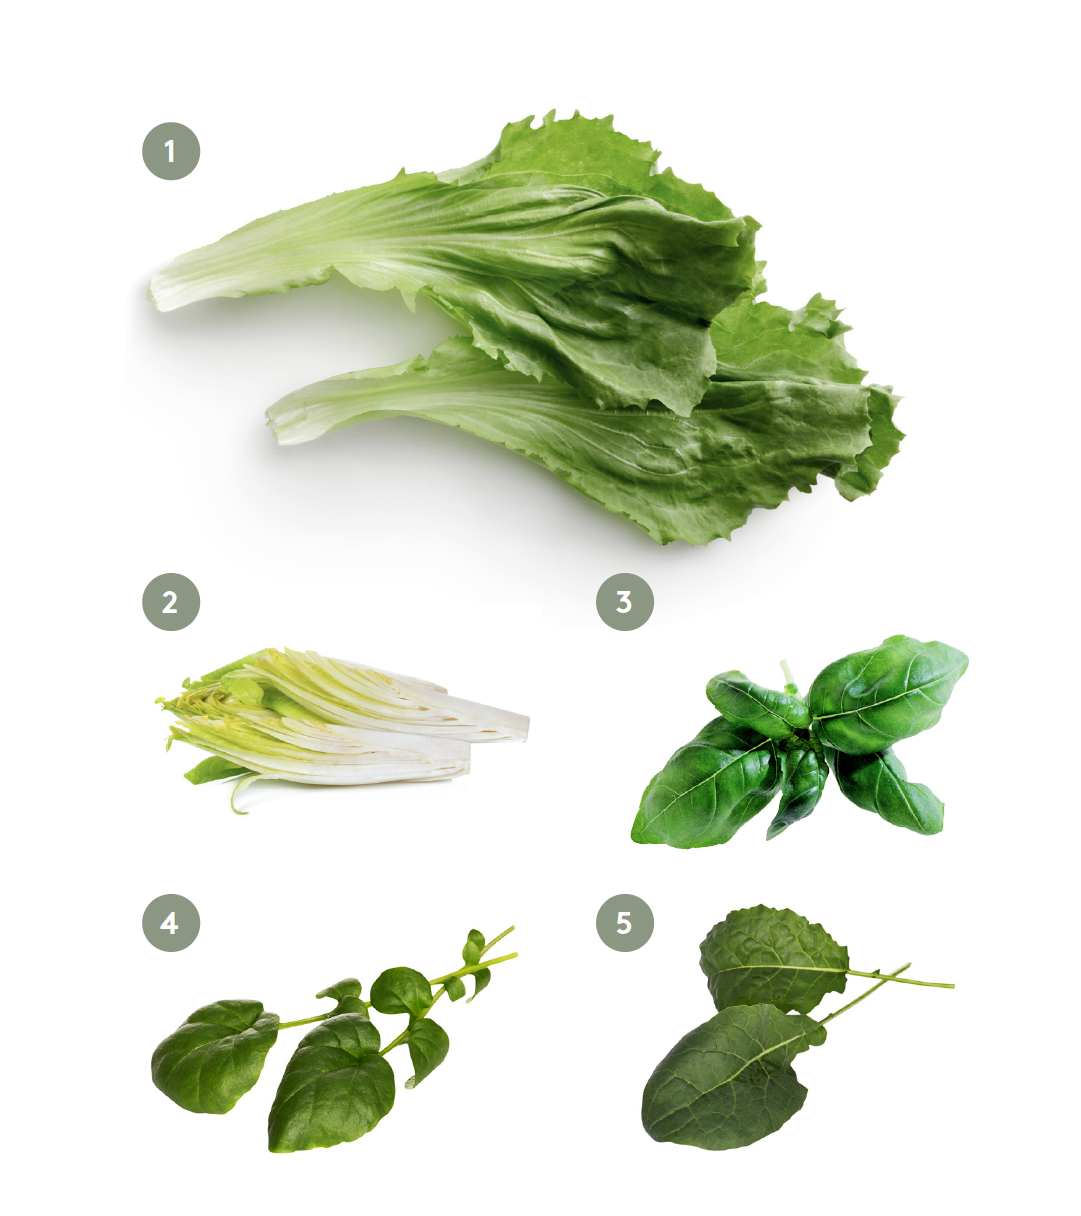 5 steg till den perfekta salladen - sallats sorter